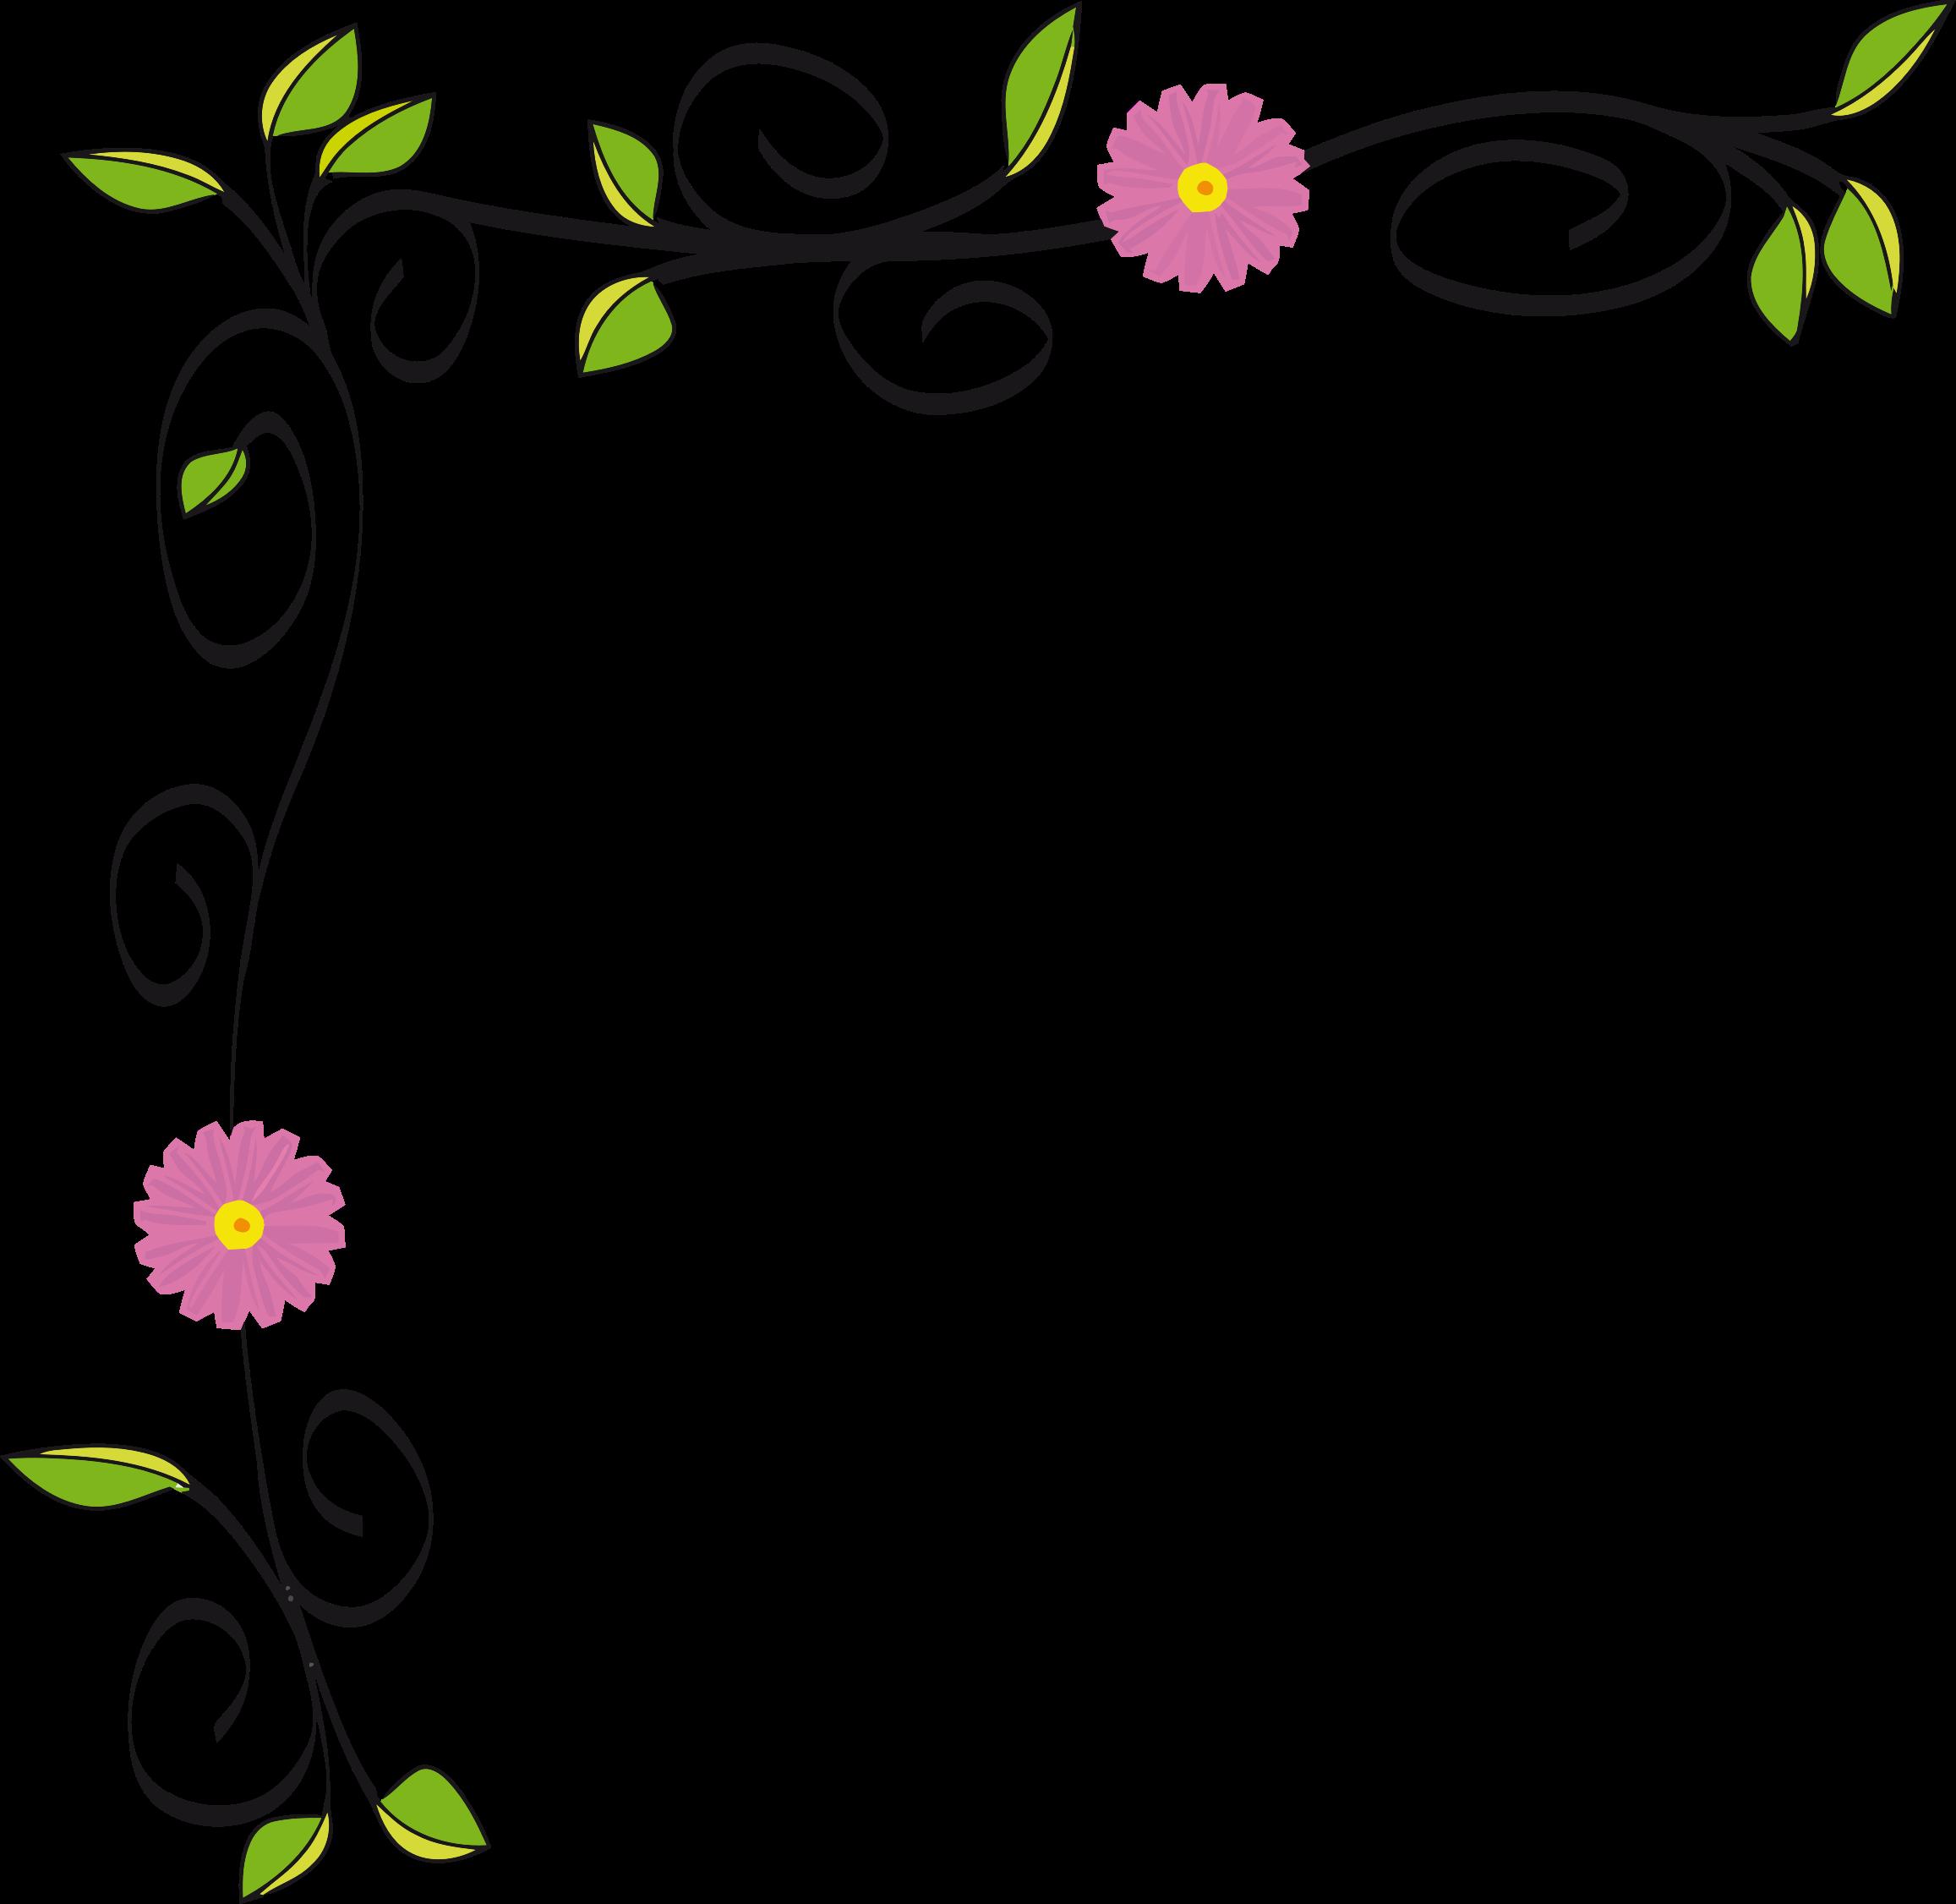 Border designs clipart clip transparent Floral Border Vectorized by GDJ   Cabinets   Flower border clipart ... clip transparent